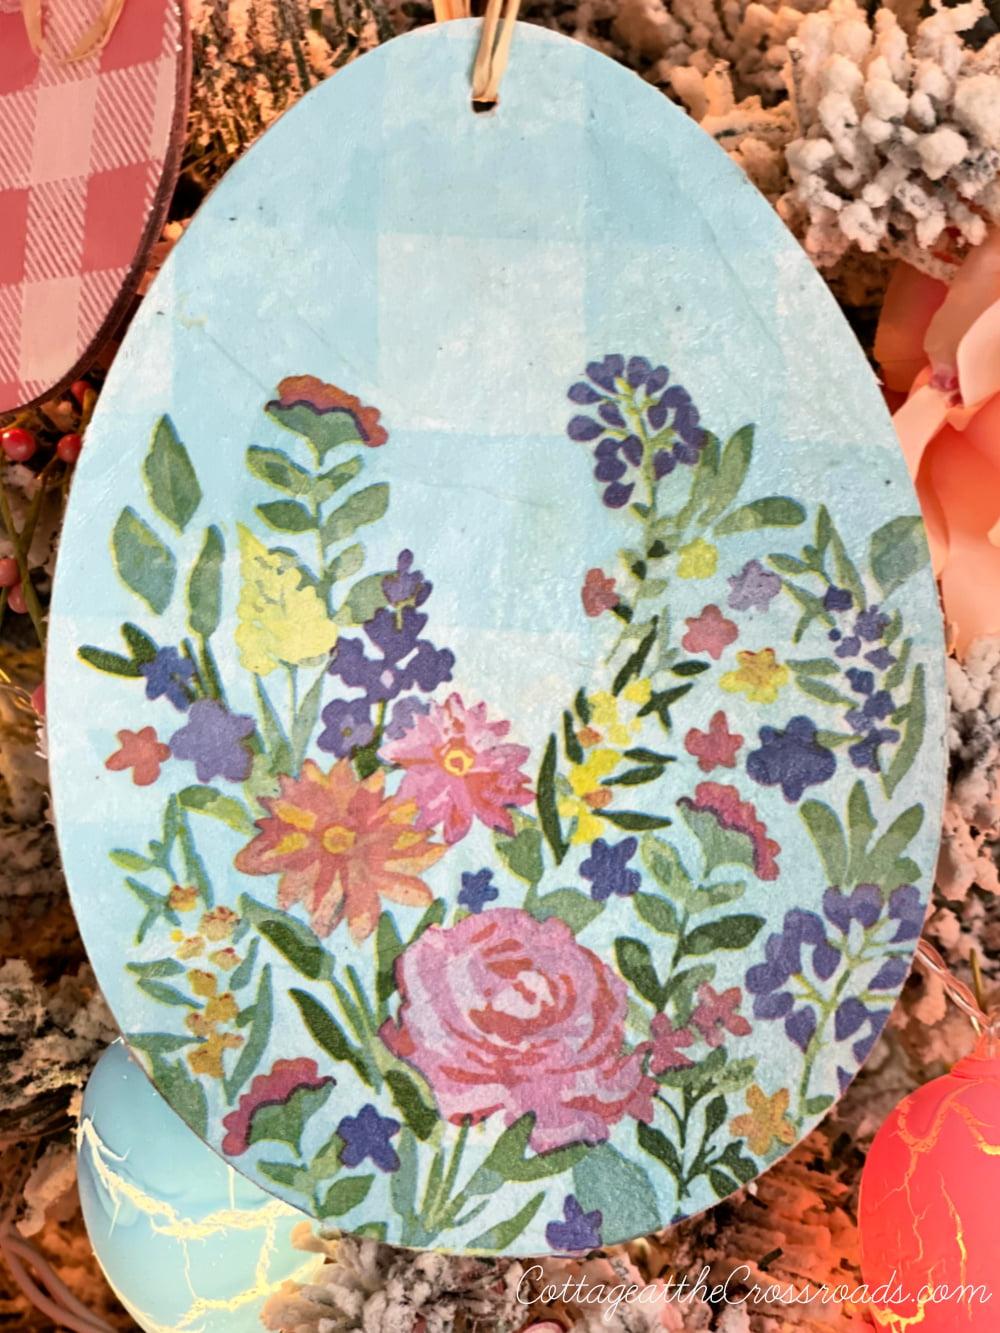 decoupaged blue and white Easter egg